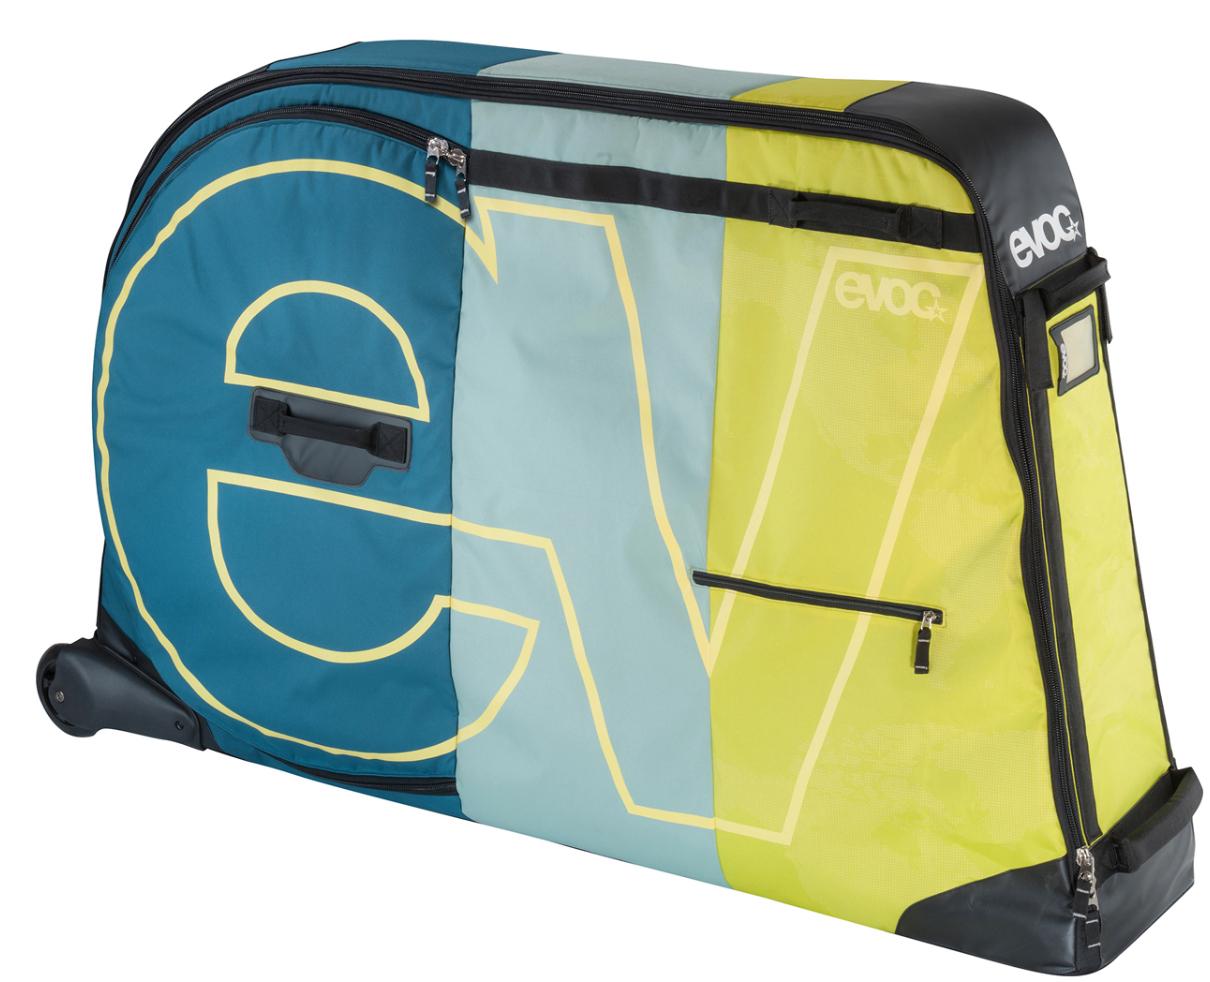 Fahrradtransporttasche Evoc Bike Travel Bag 280l